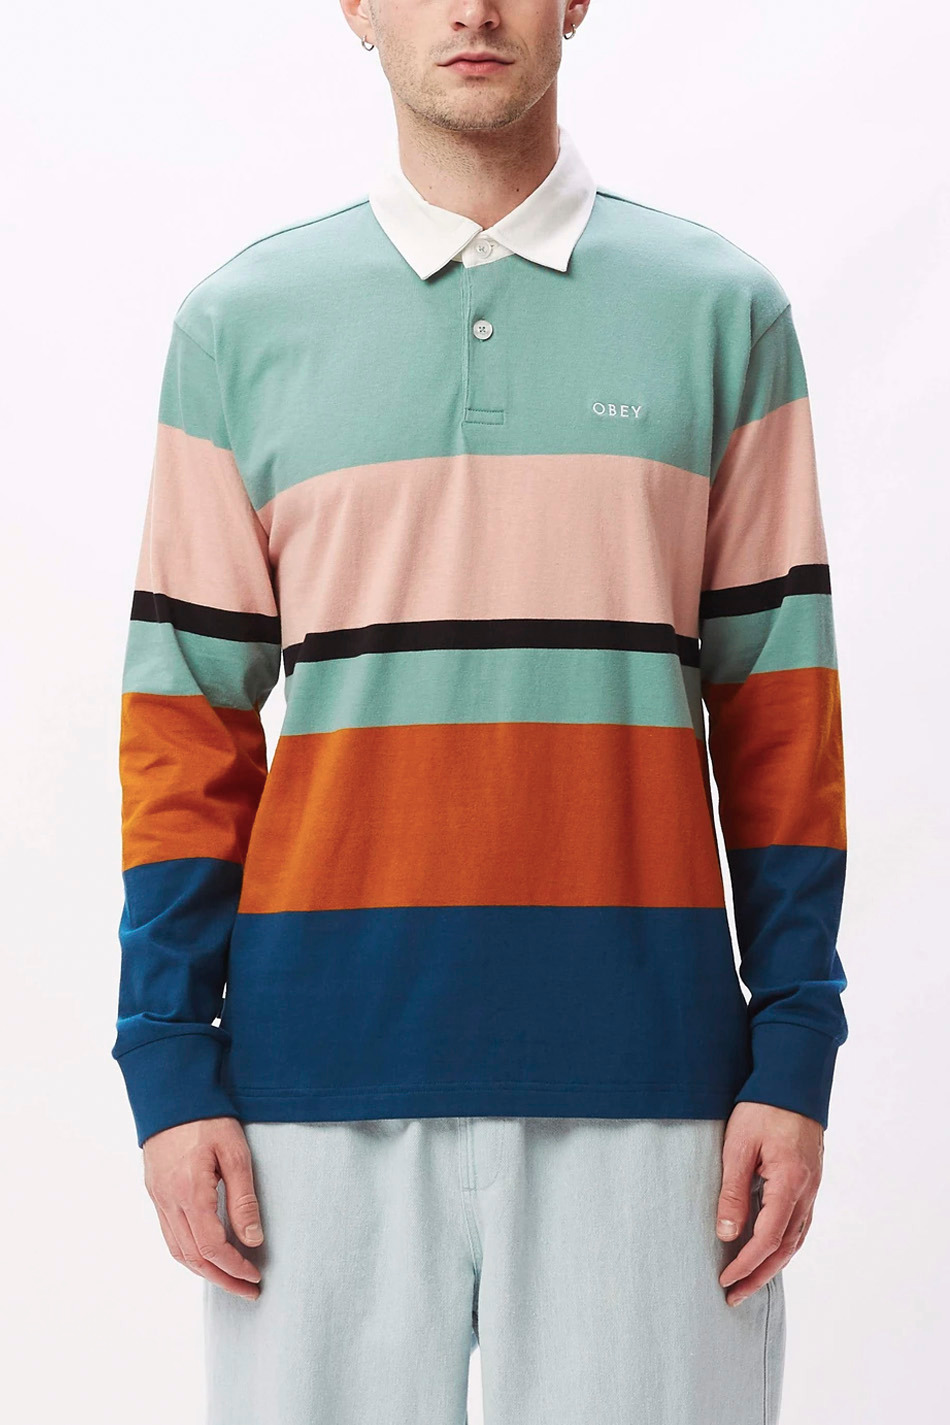 Obey Benny Polo Shirt